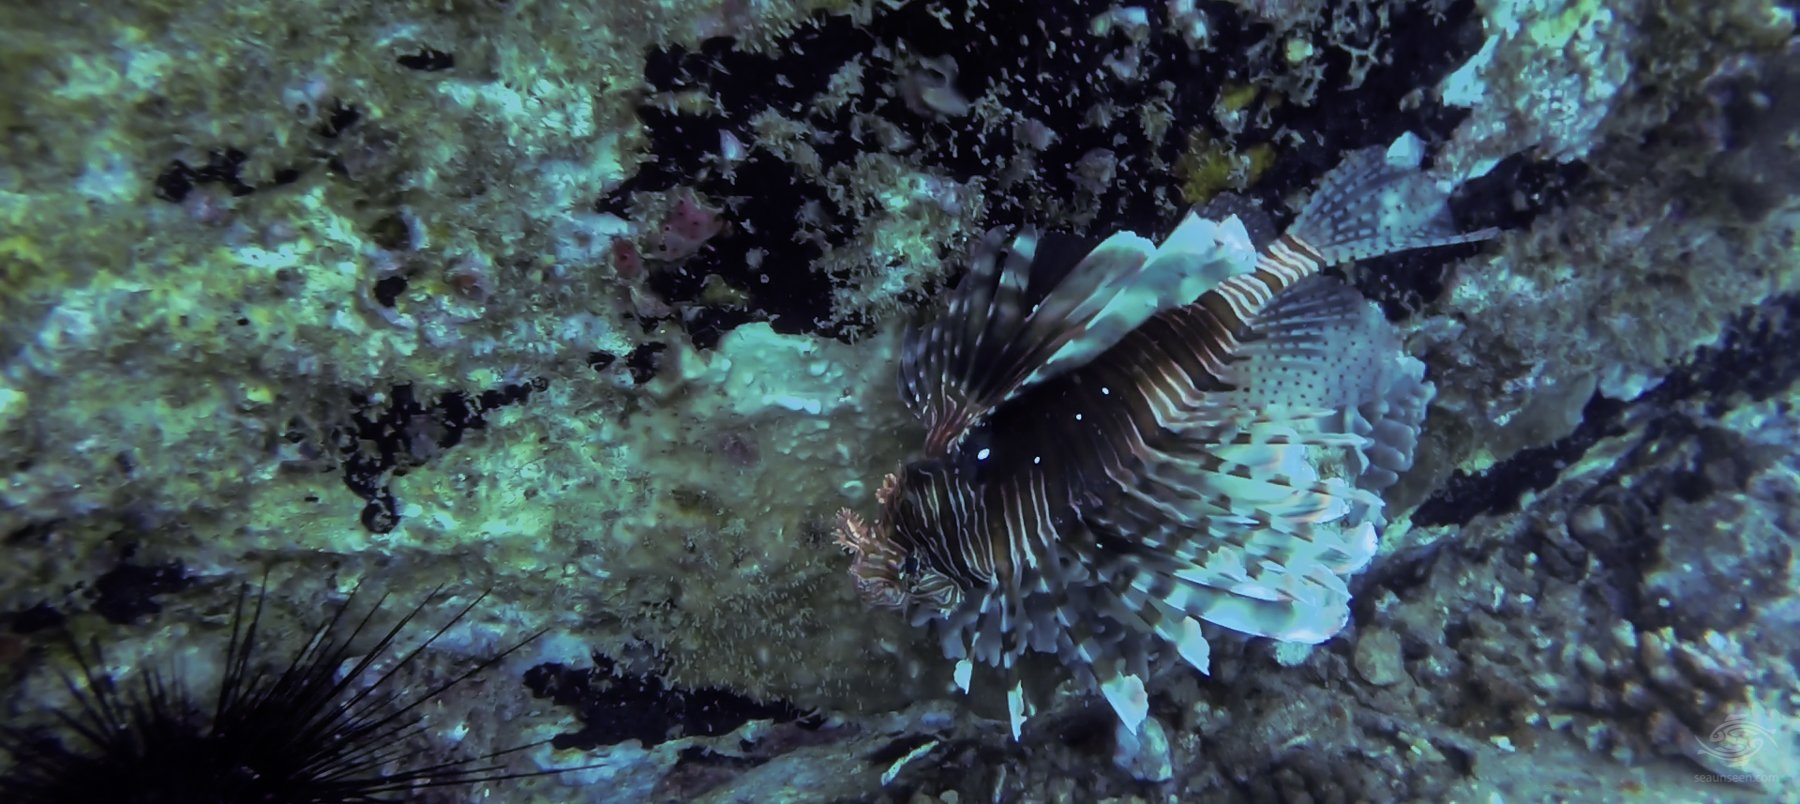 Lionfish on Slemmestad Wreck